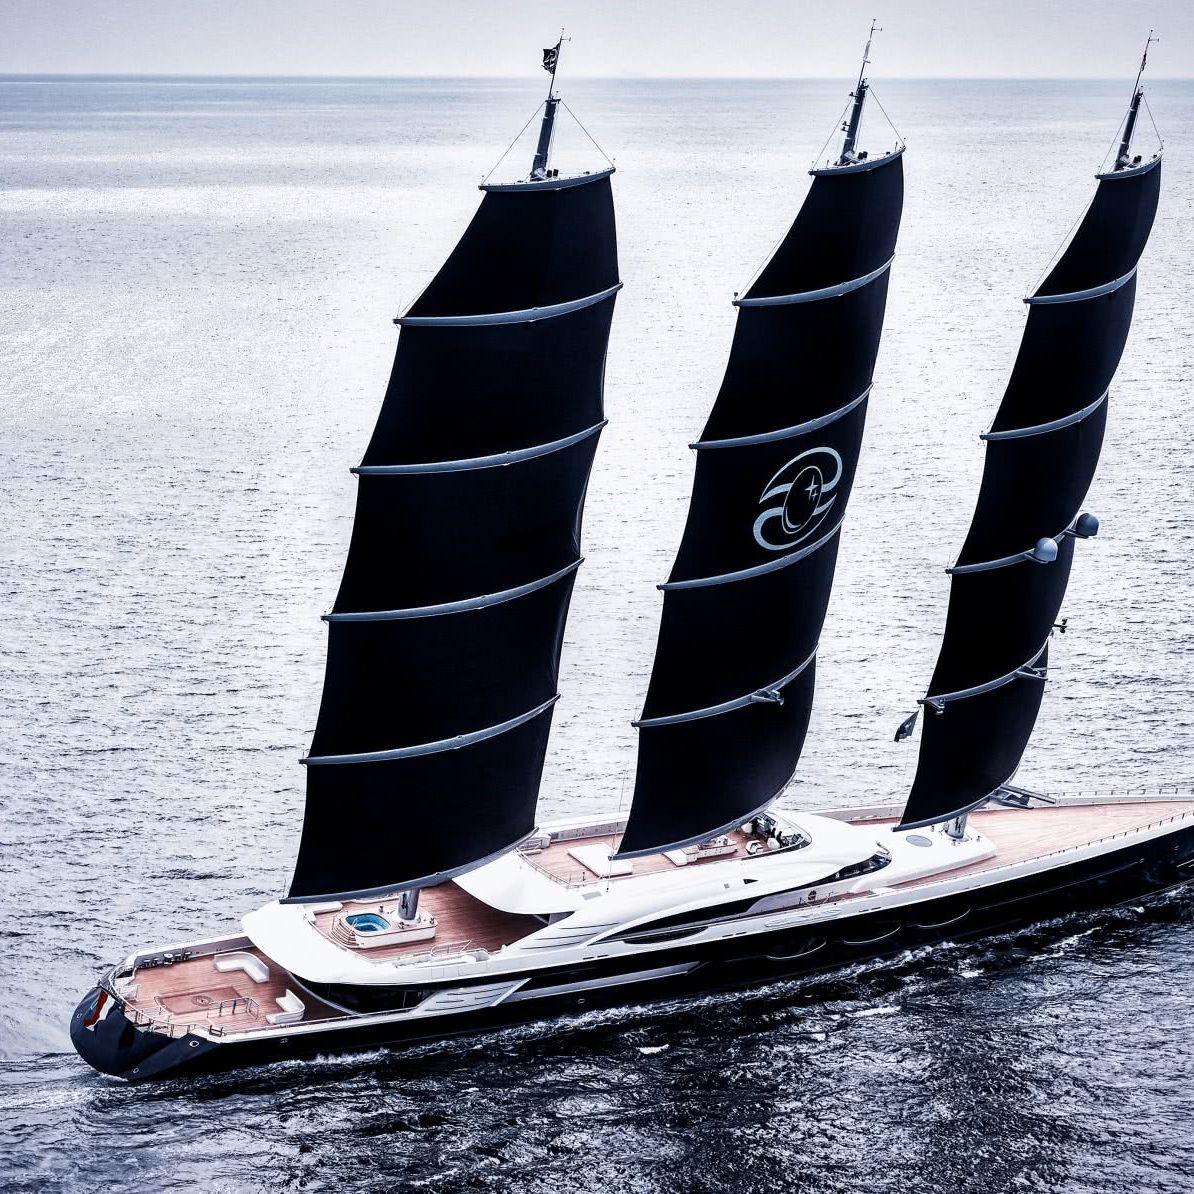 Black Pearl Sailing Yacht Oceanco